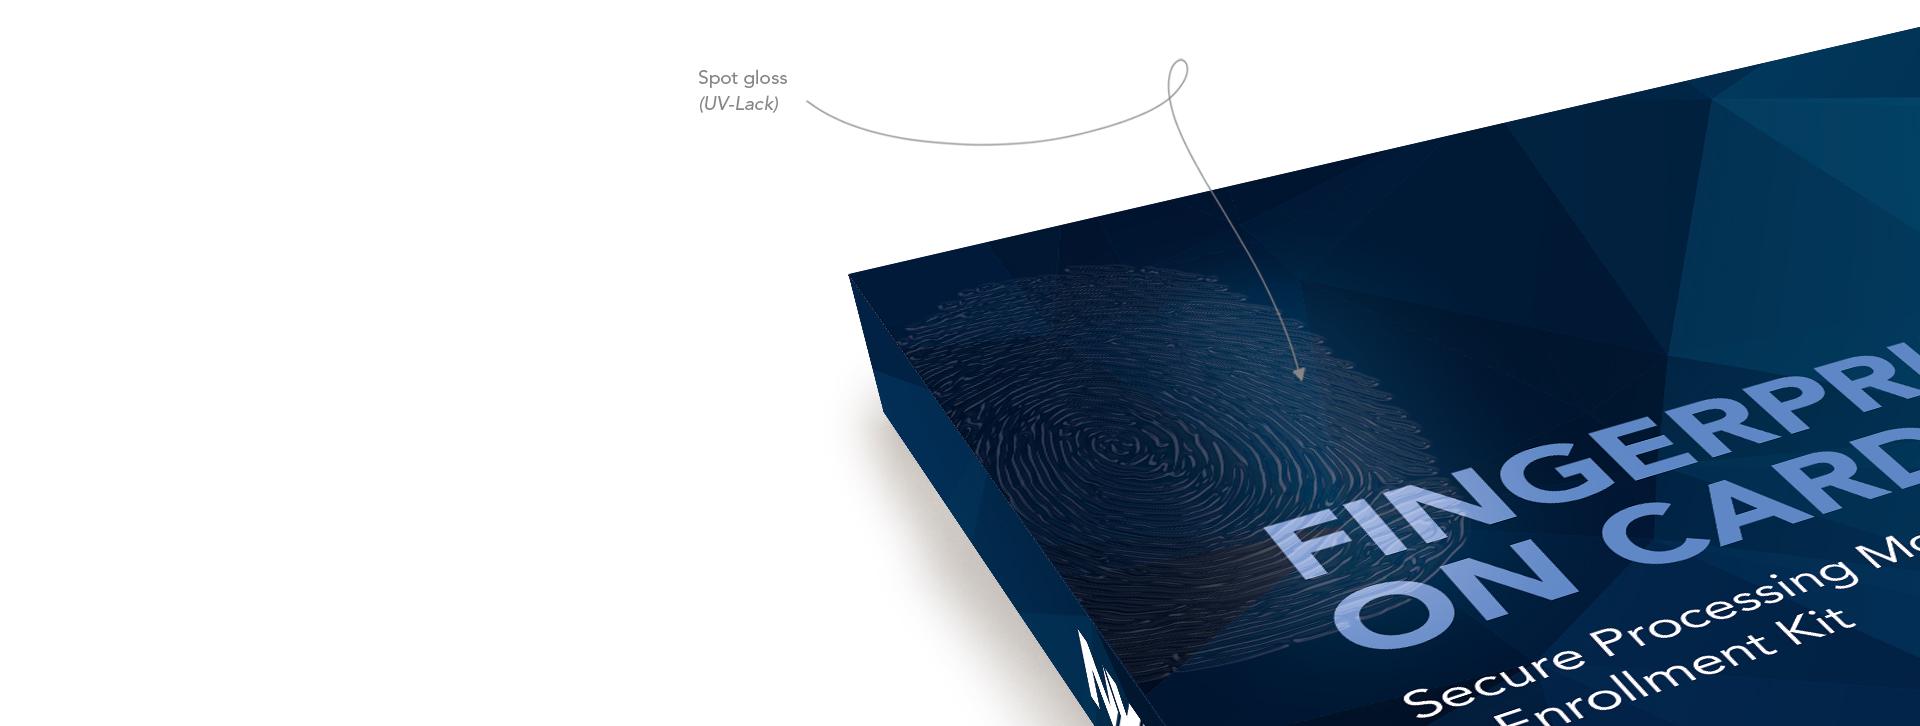 Fingerprint on Card NXP Technology packaging by Flair Creatives